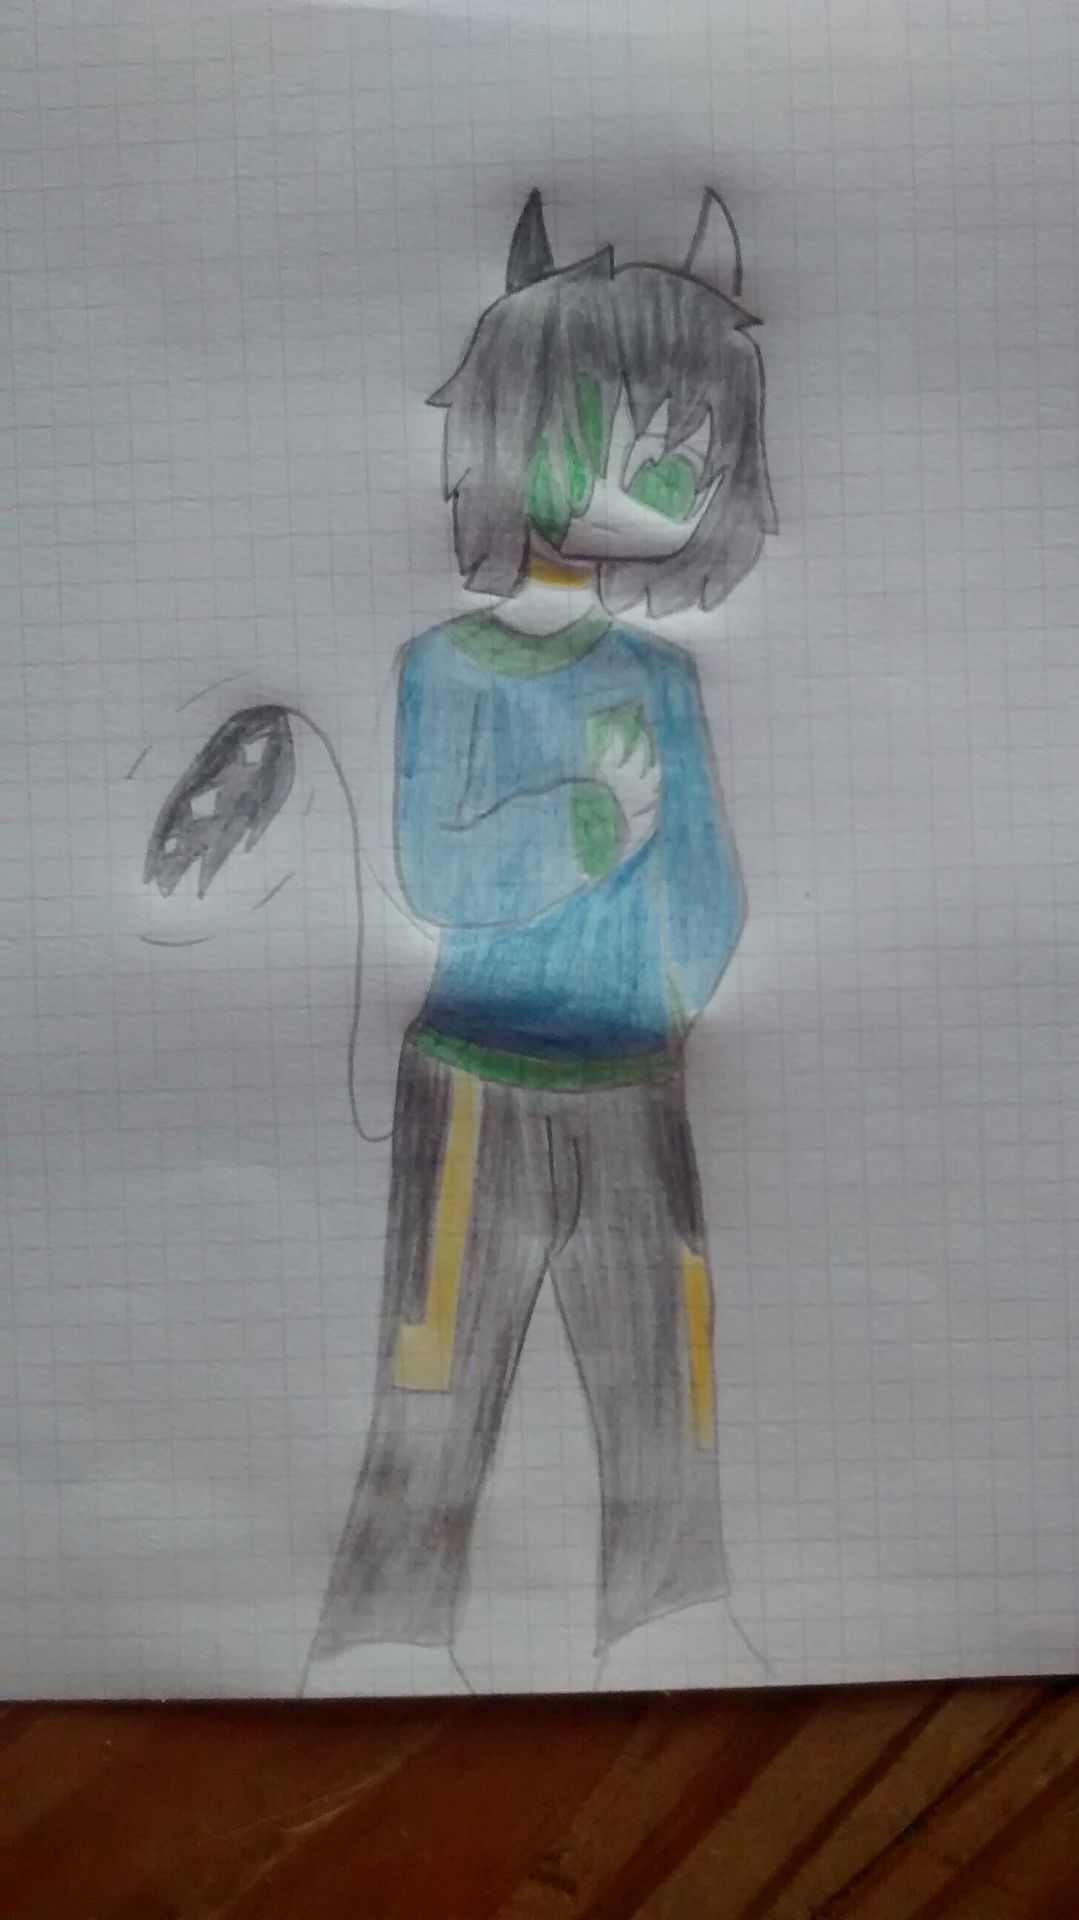 Mis Dibujos 2 3 Dibujos Dibujos Feos Feos